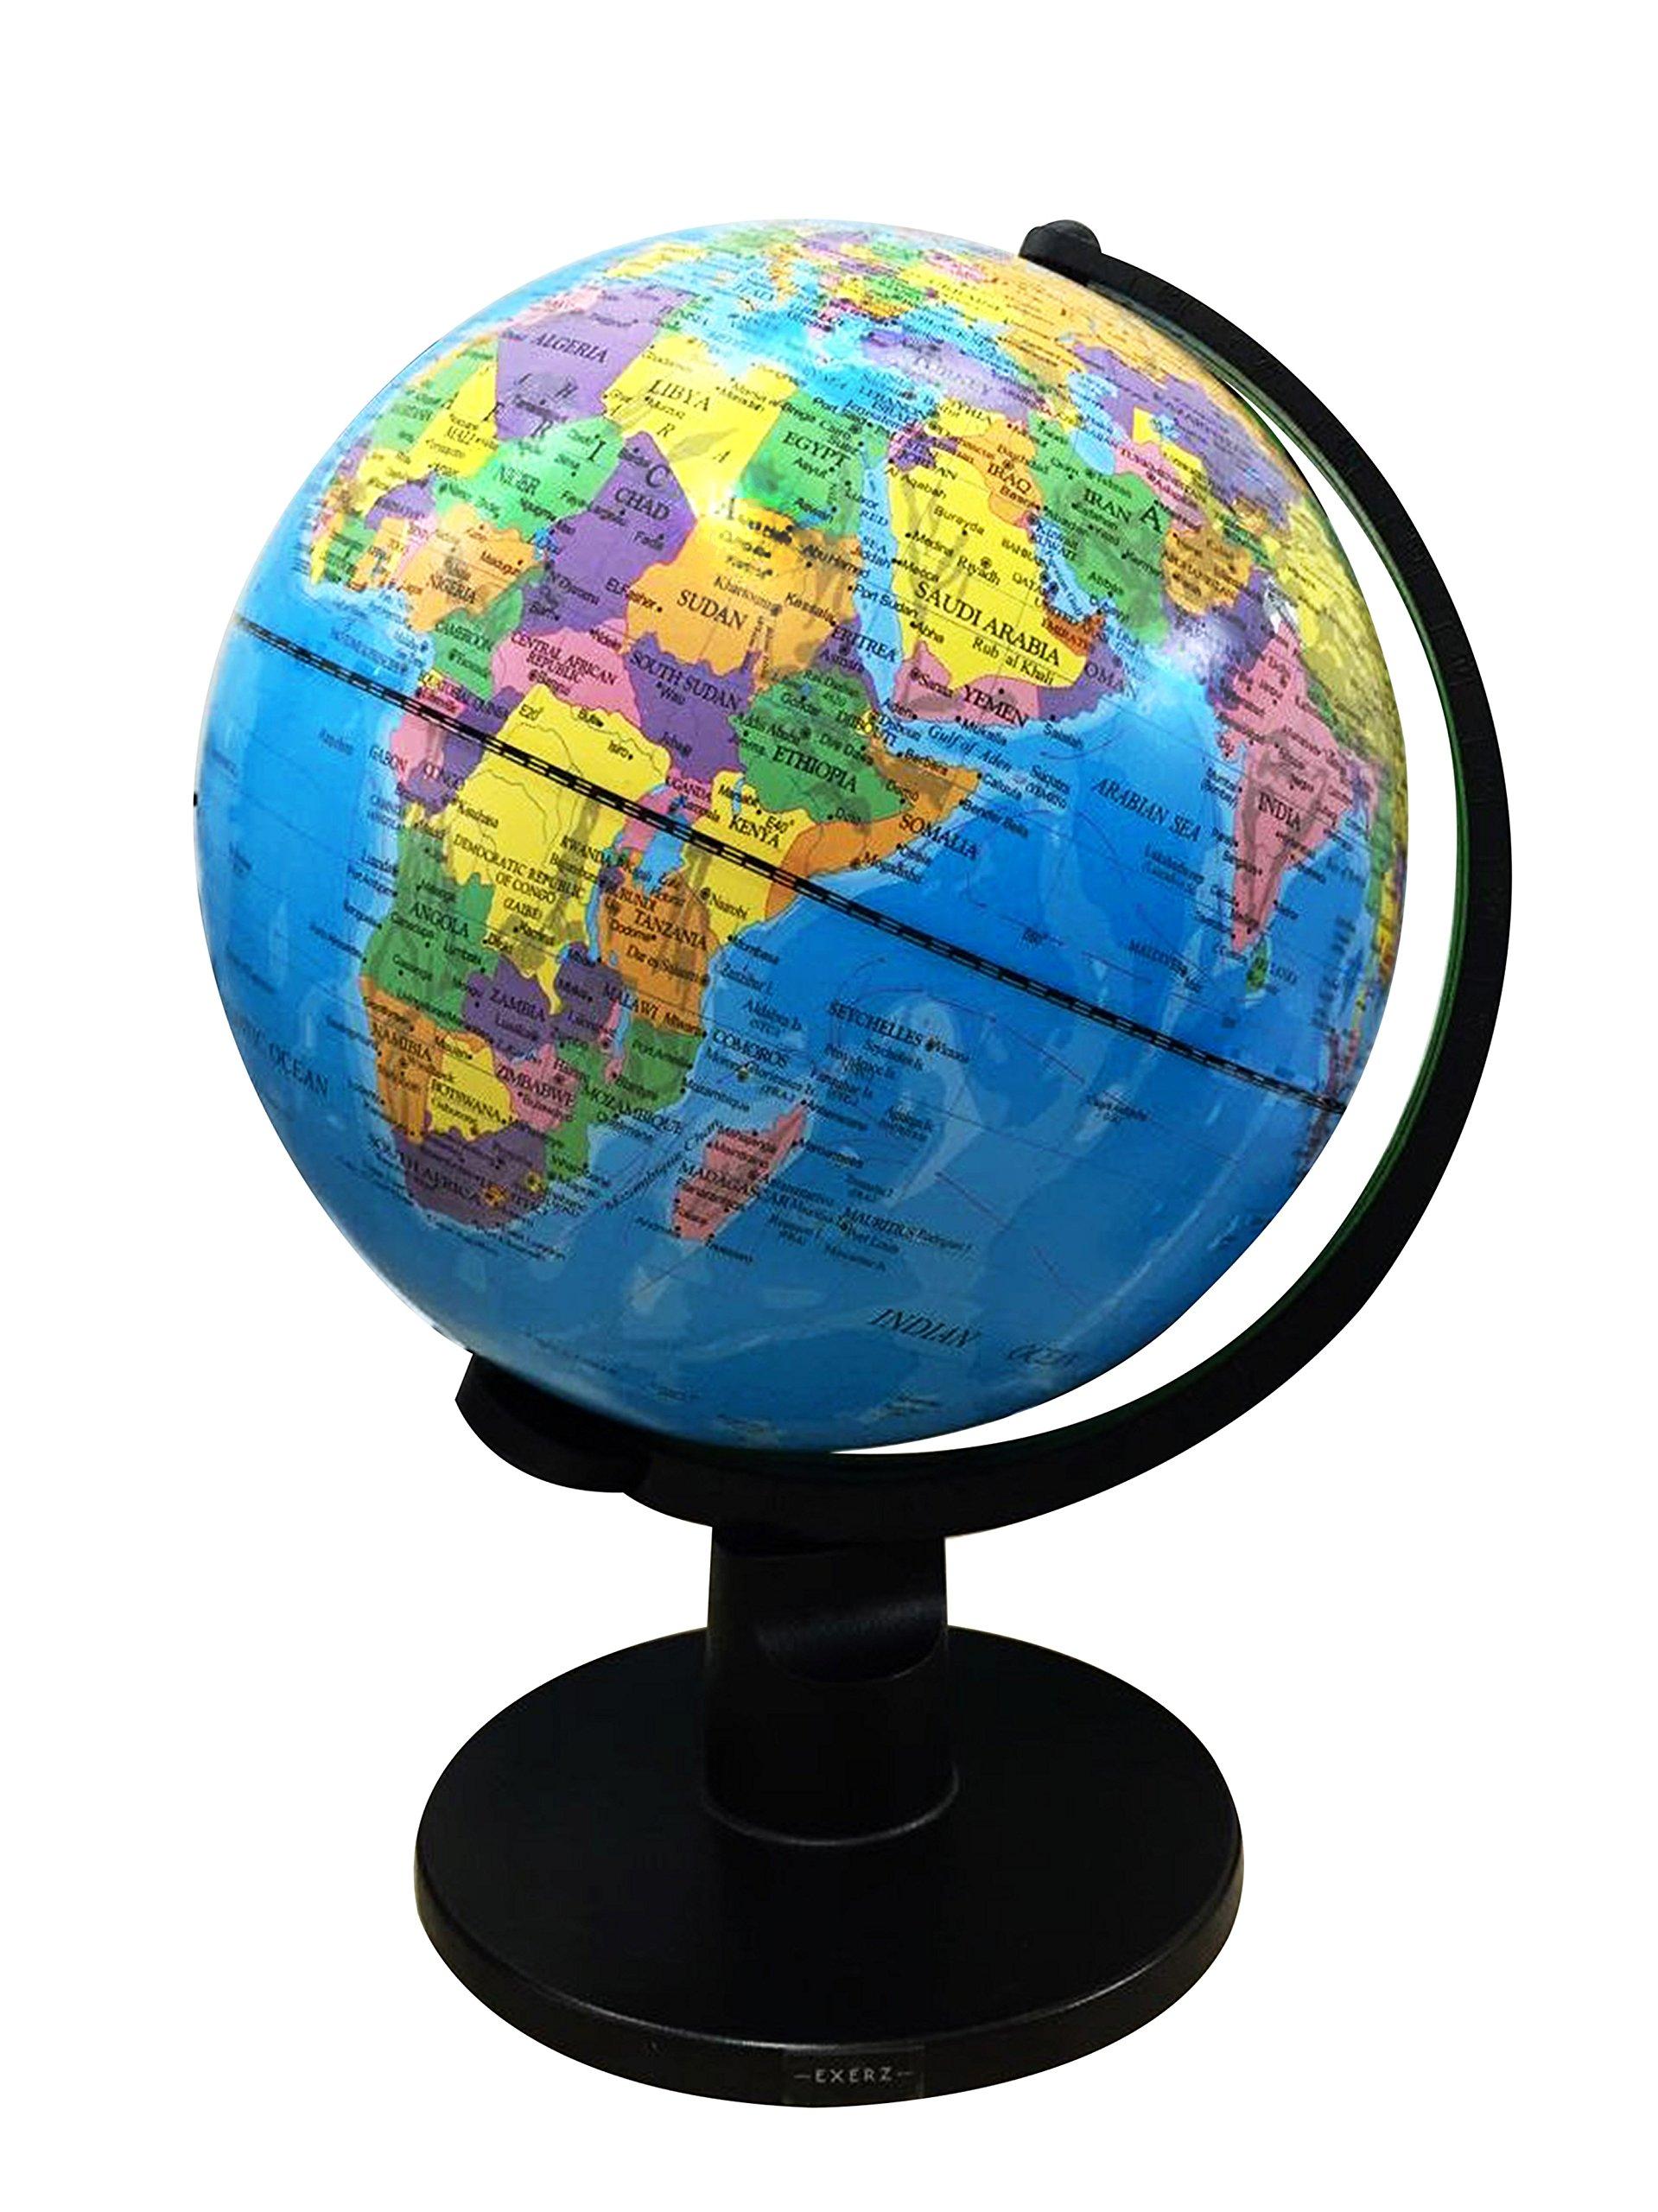 Exerz Educational Swivel Globe (Large Dia 10'' / 25cm) - Political Desktop World Globe